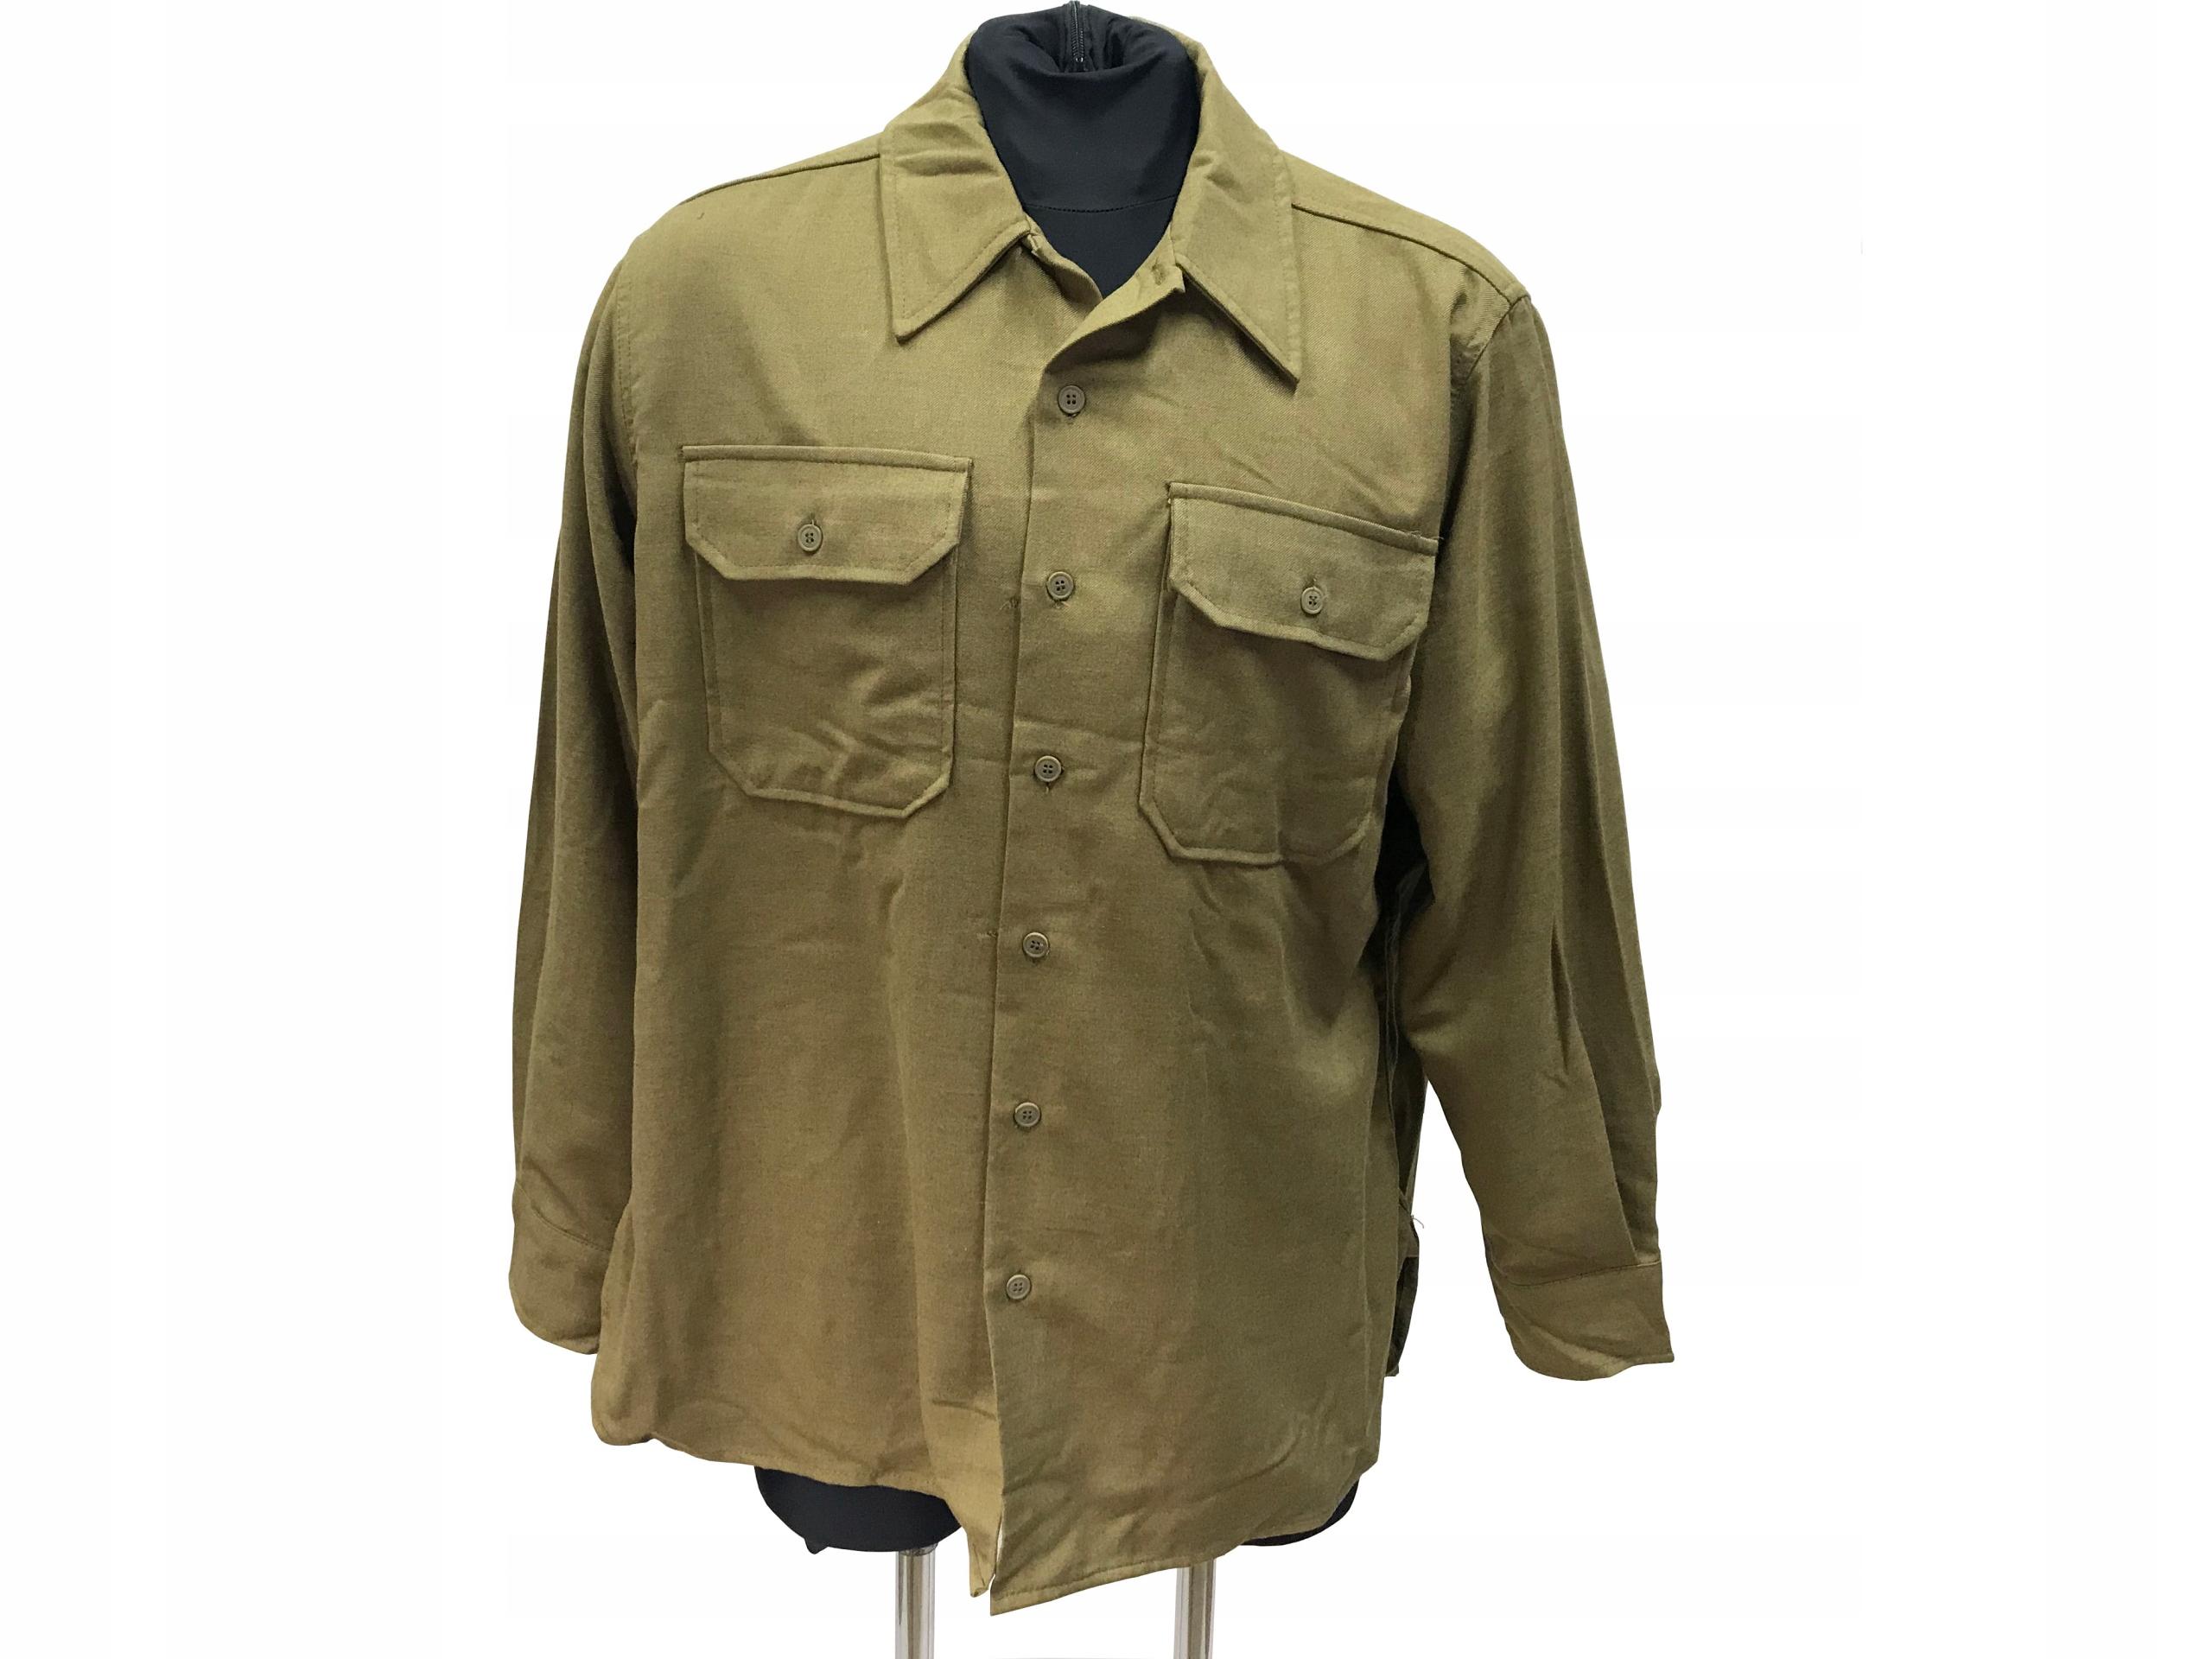 M37 XL USA Shirt New Replica